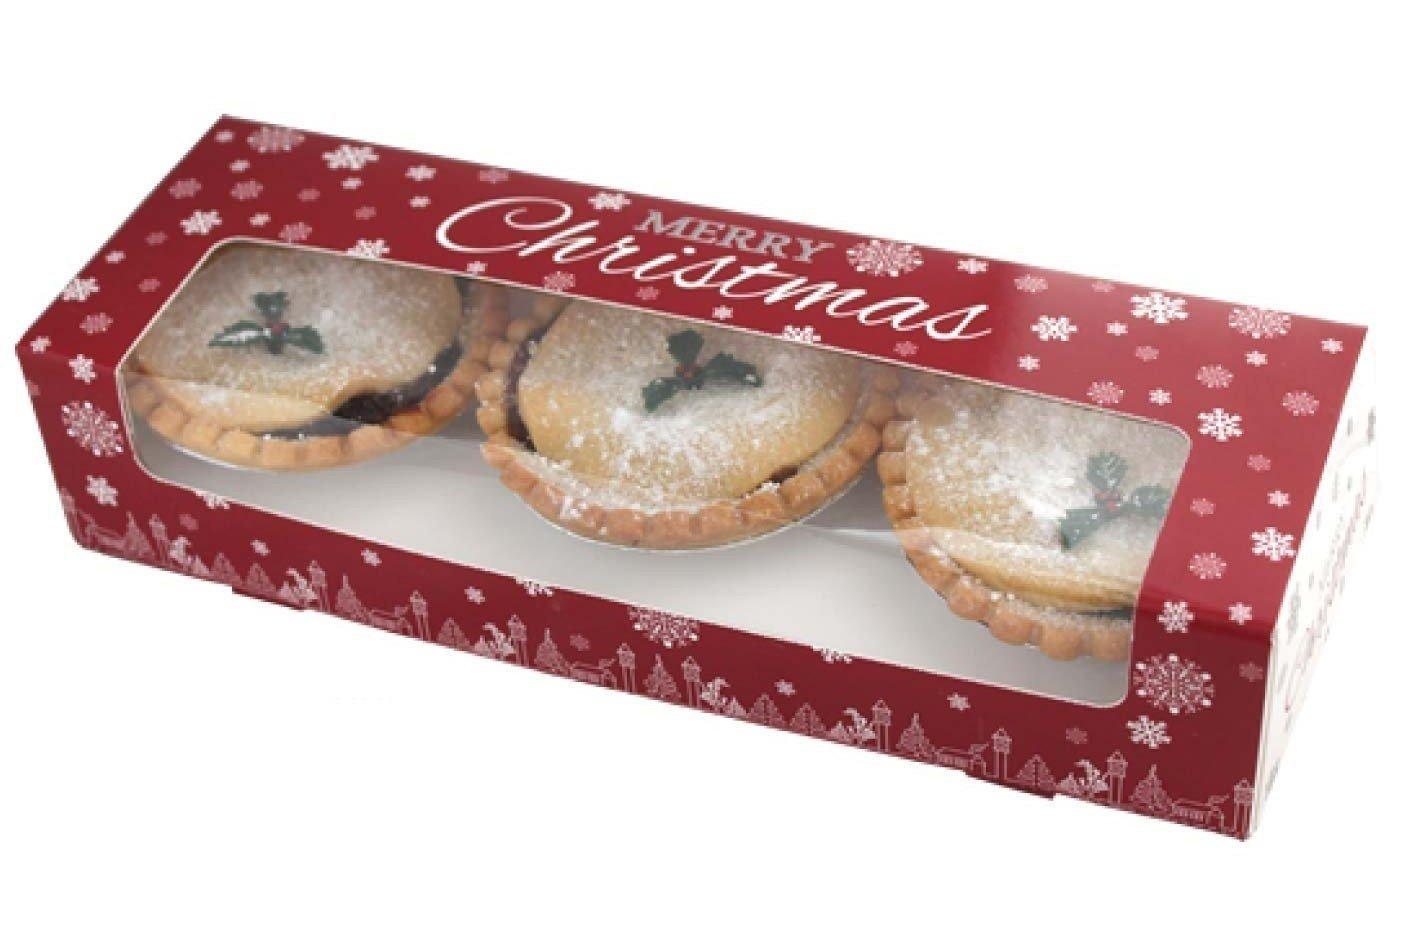 Natale mince pie Boxes Snowflake design double Stack con inserto- Pack 5 The Cake Emporium Ltd